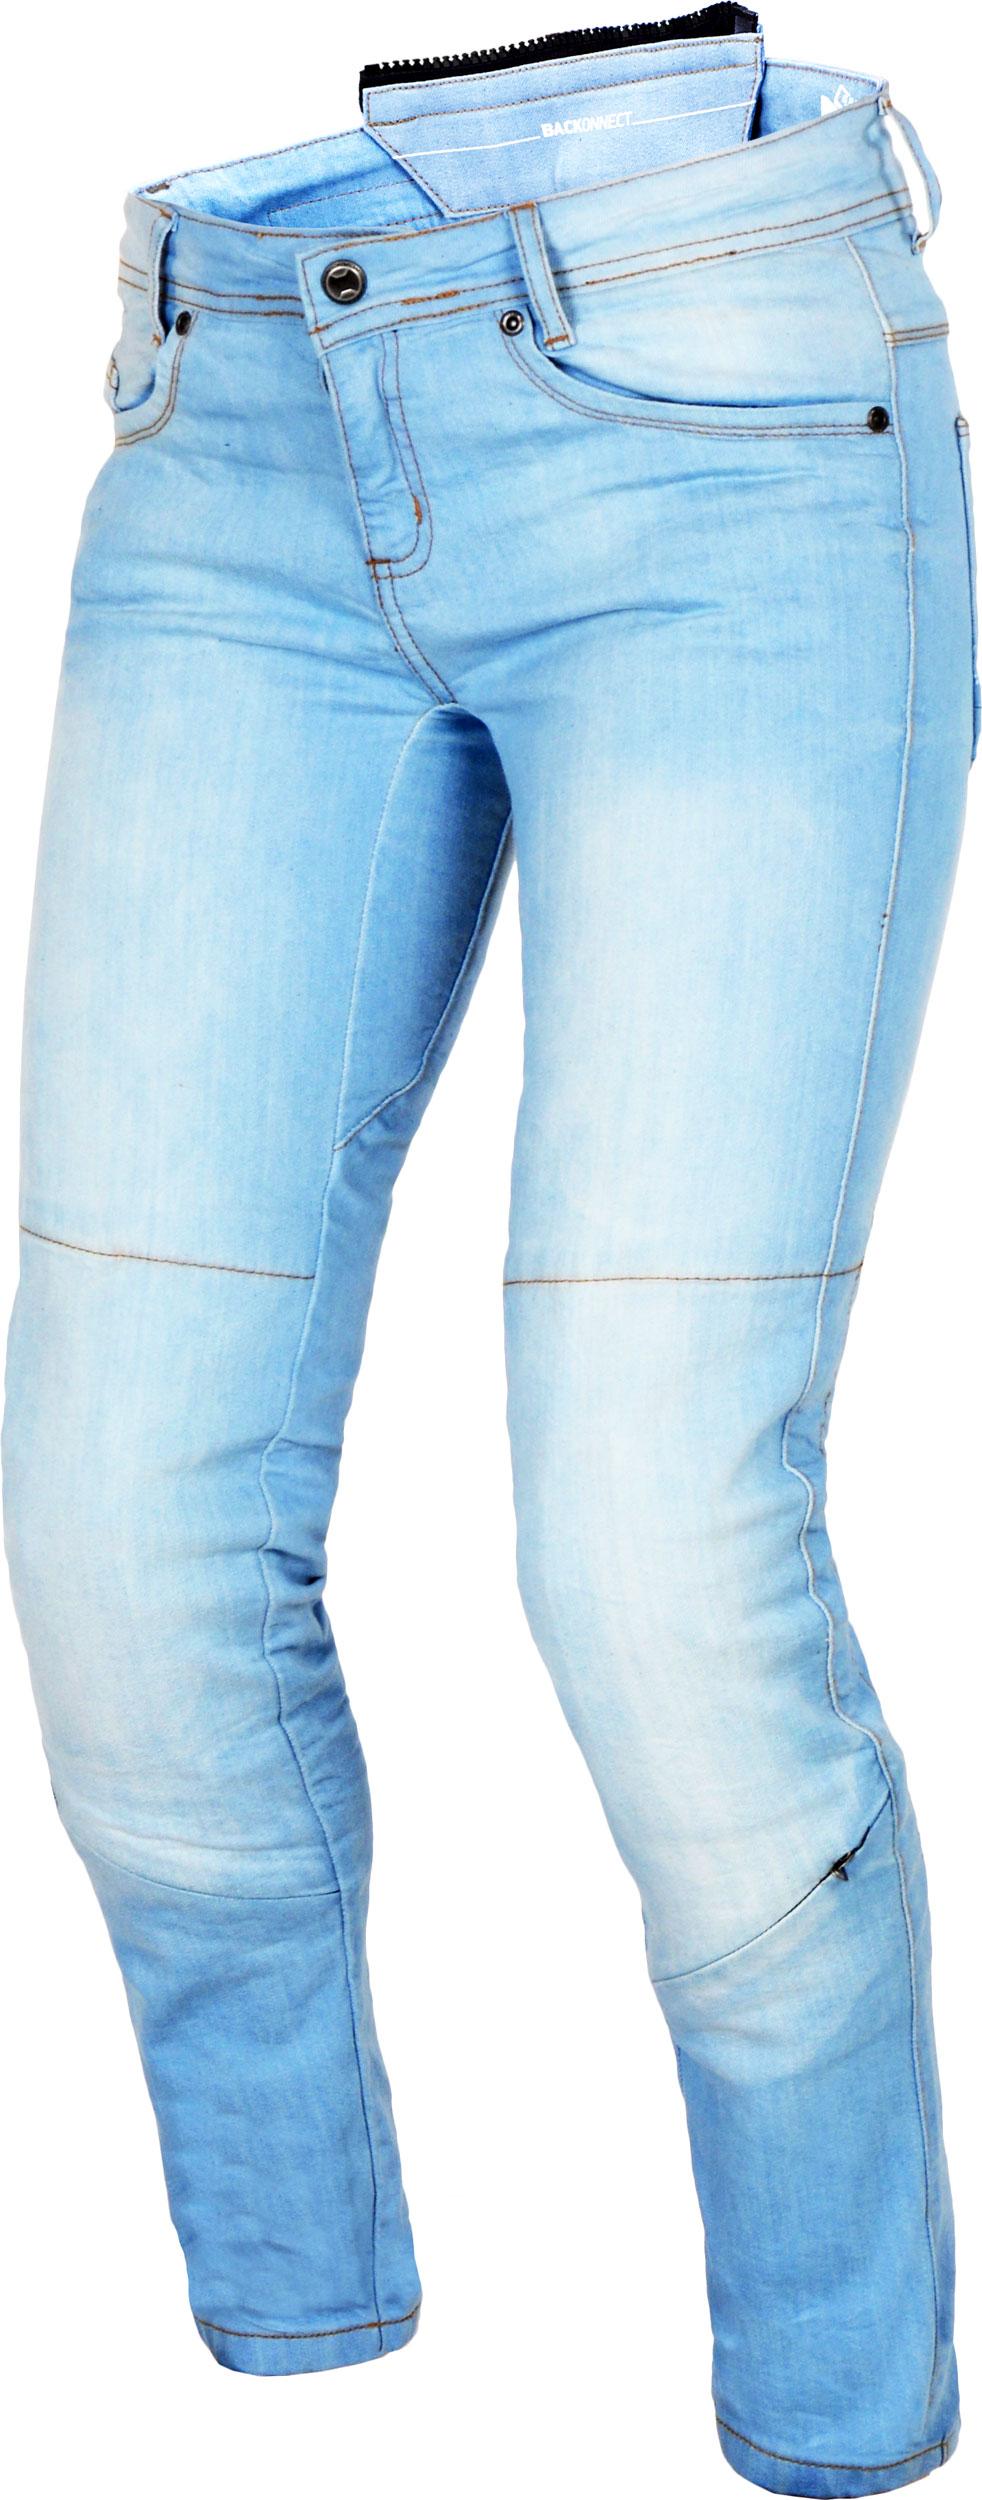 Macna Jenny, Jeans Damen - Grau - 26 165-4002-26-808